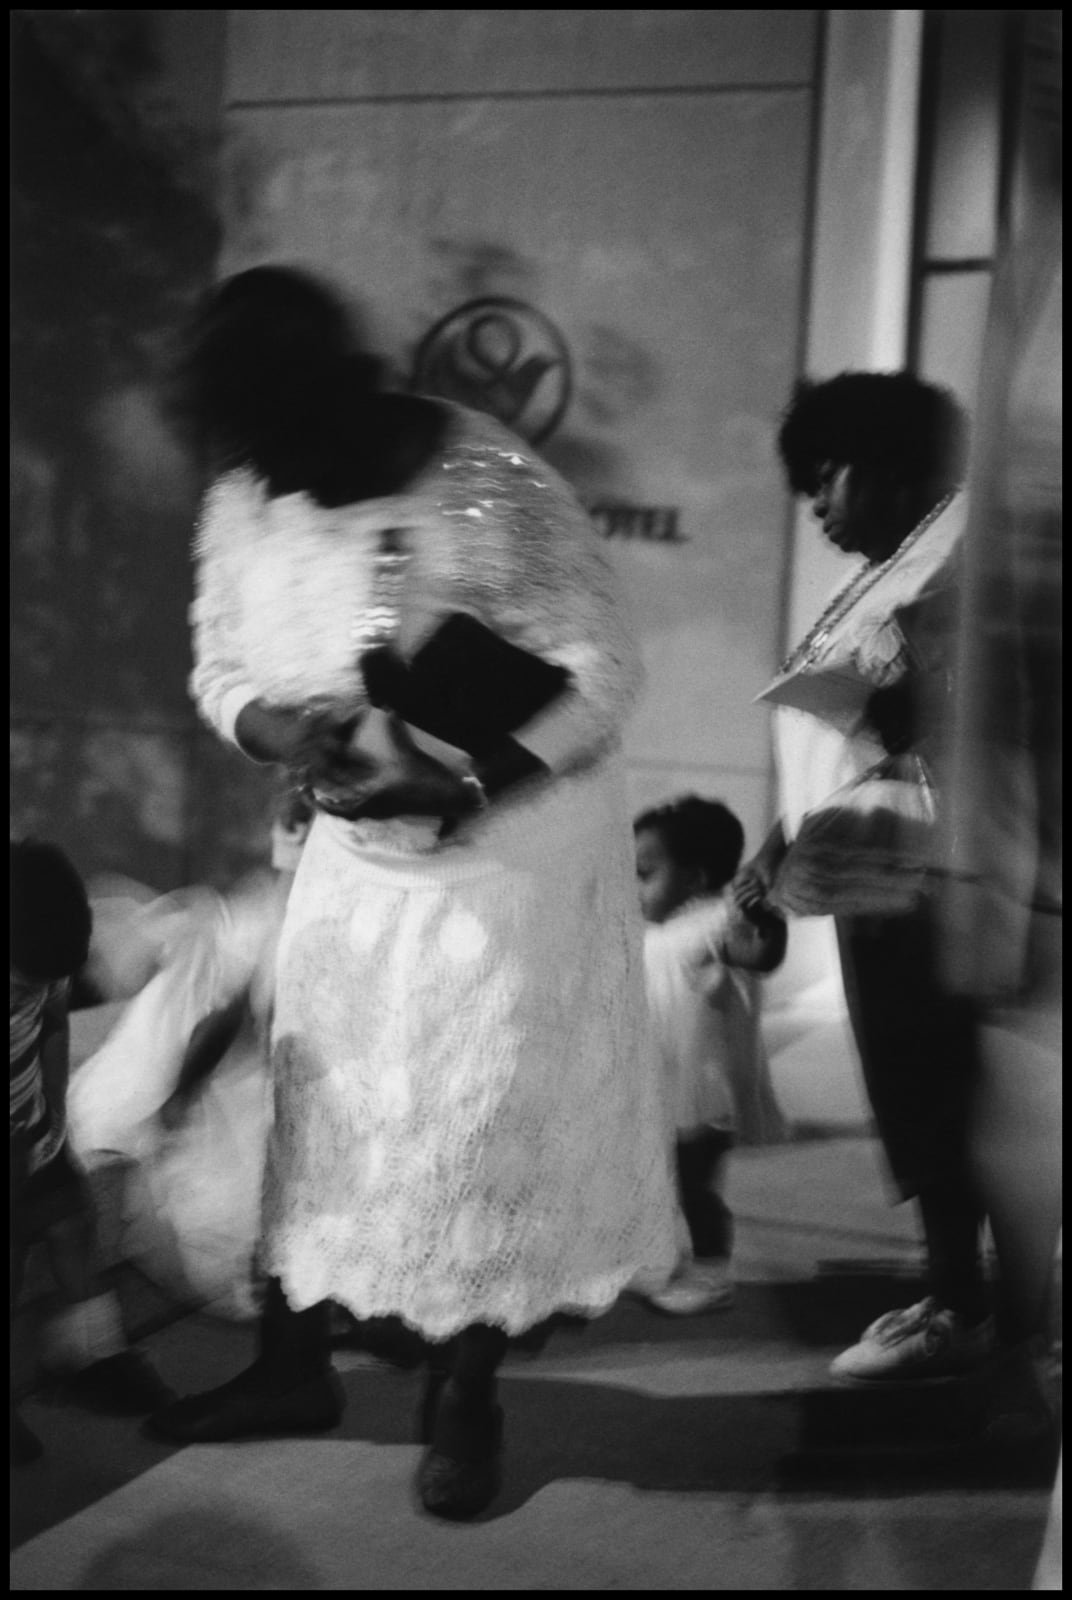 Ming Smith, First Sunday I (Grandmother's Pocketbook), 1980